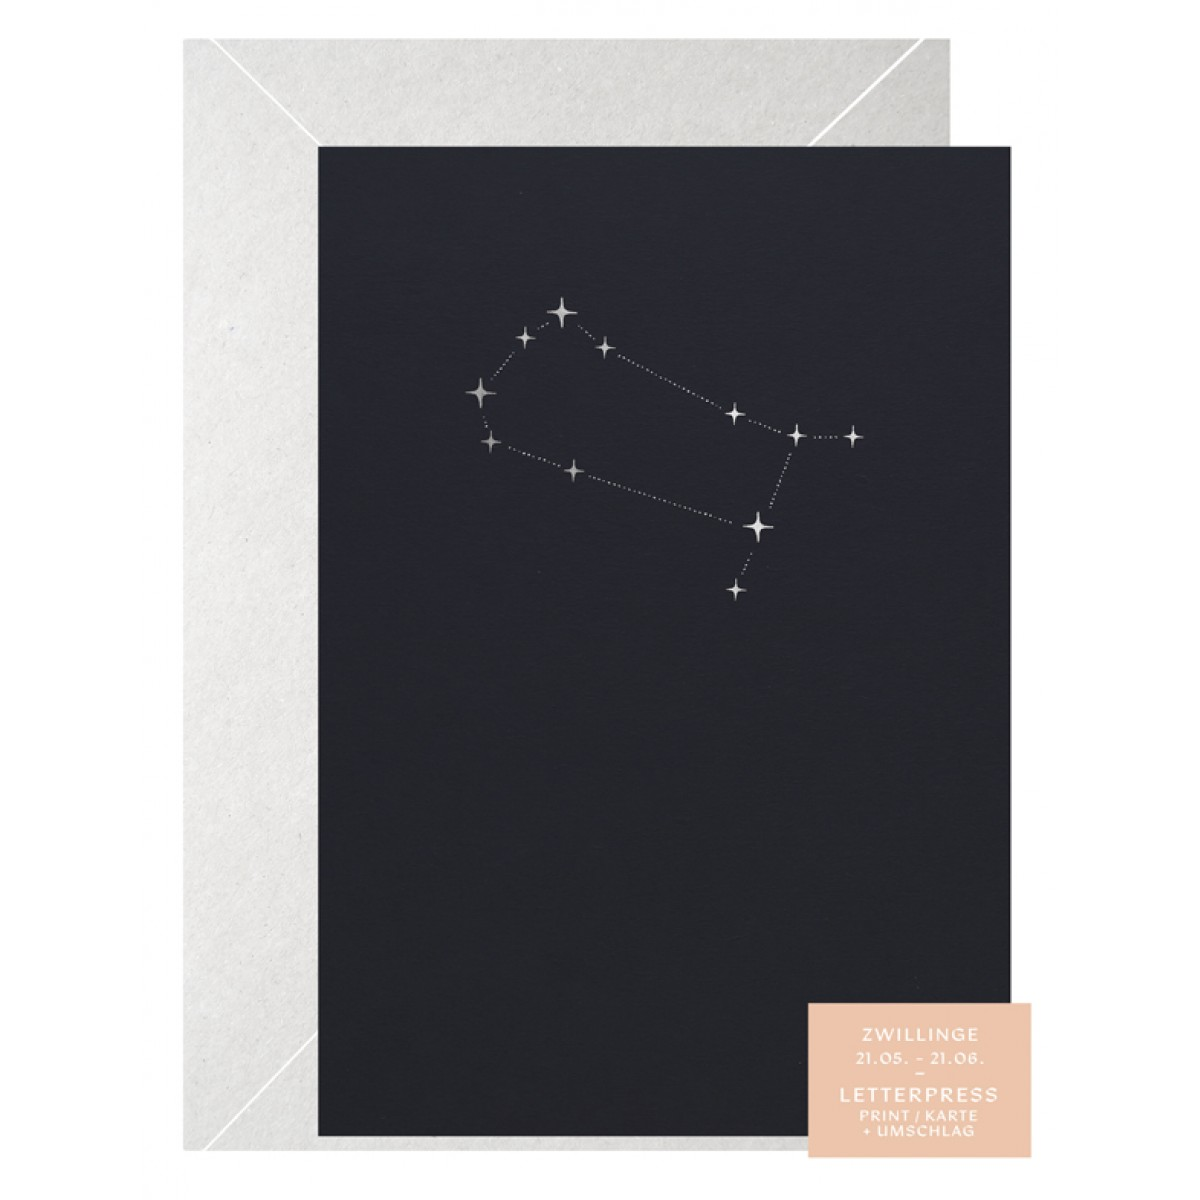 ZWILLING STERNZEICHEN - A5 Print - Letterpress – Anna Cosma